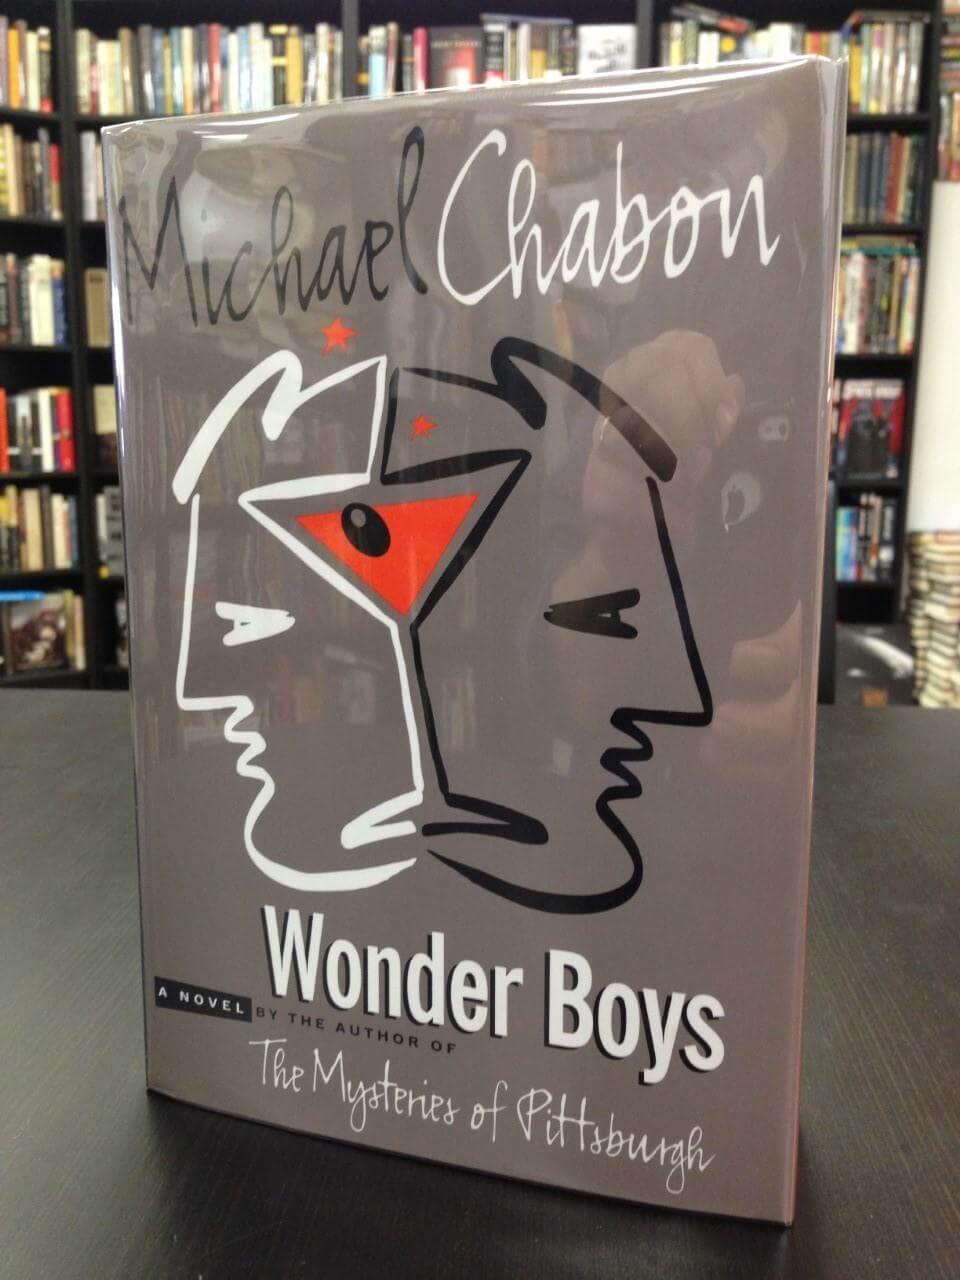 Michael Chabon - Wonder Boys